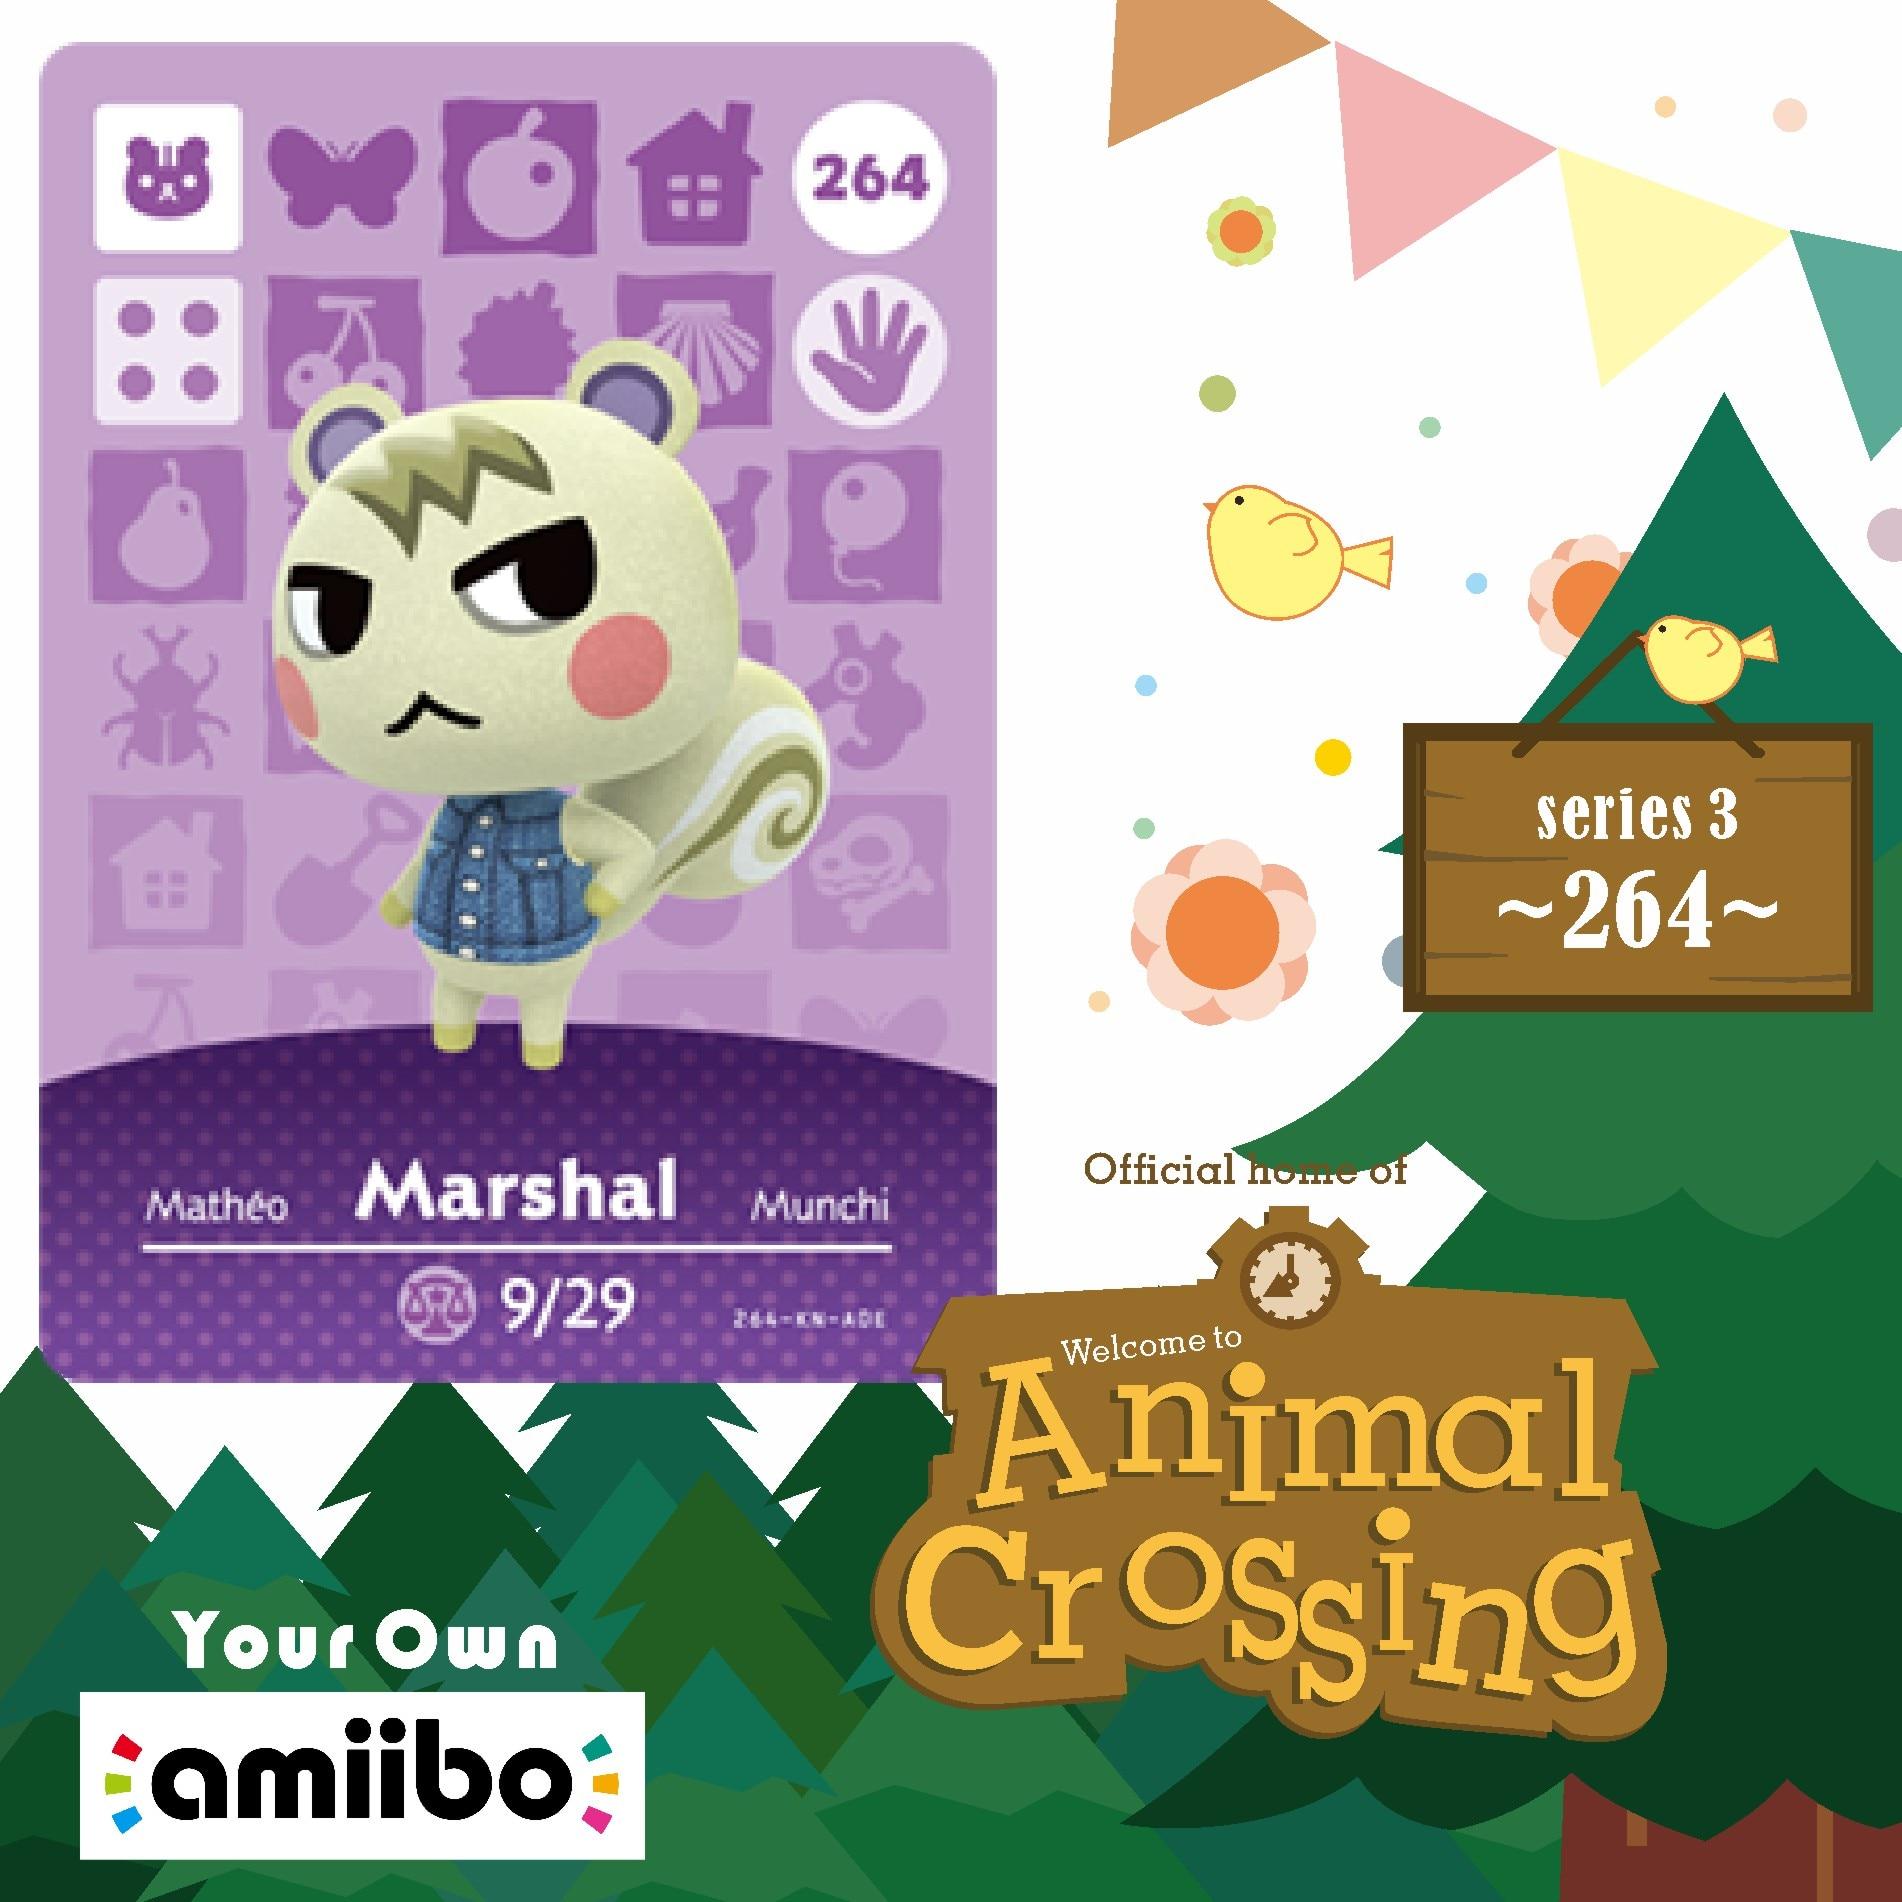 Marshal Animal Crossing Marshal Amiibo 264 Animal Crossing Switch Rv Welcome Amiibo Villager New Horizons Amiibo Card Series 3